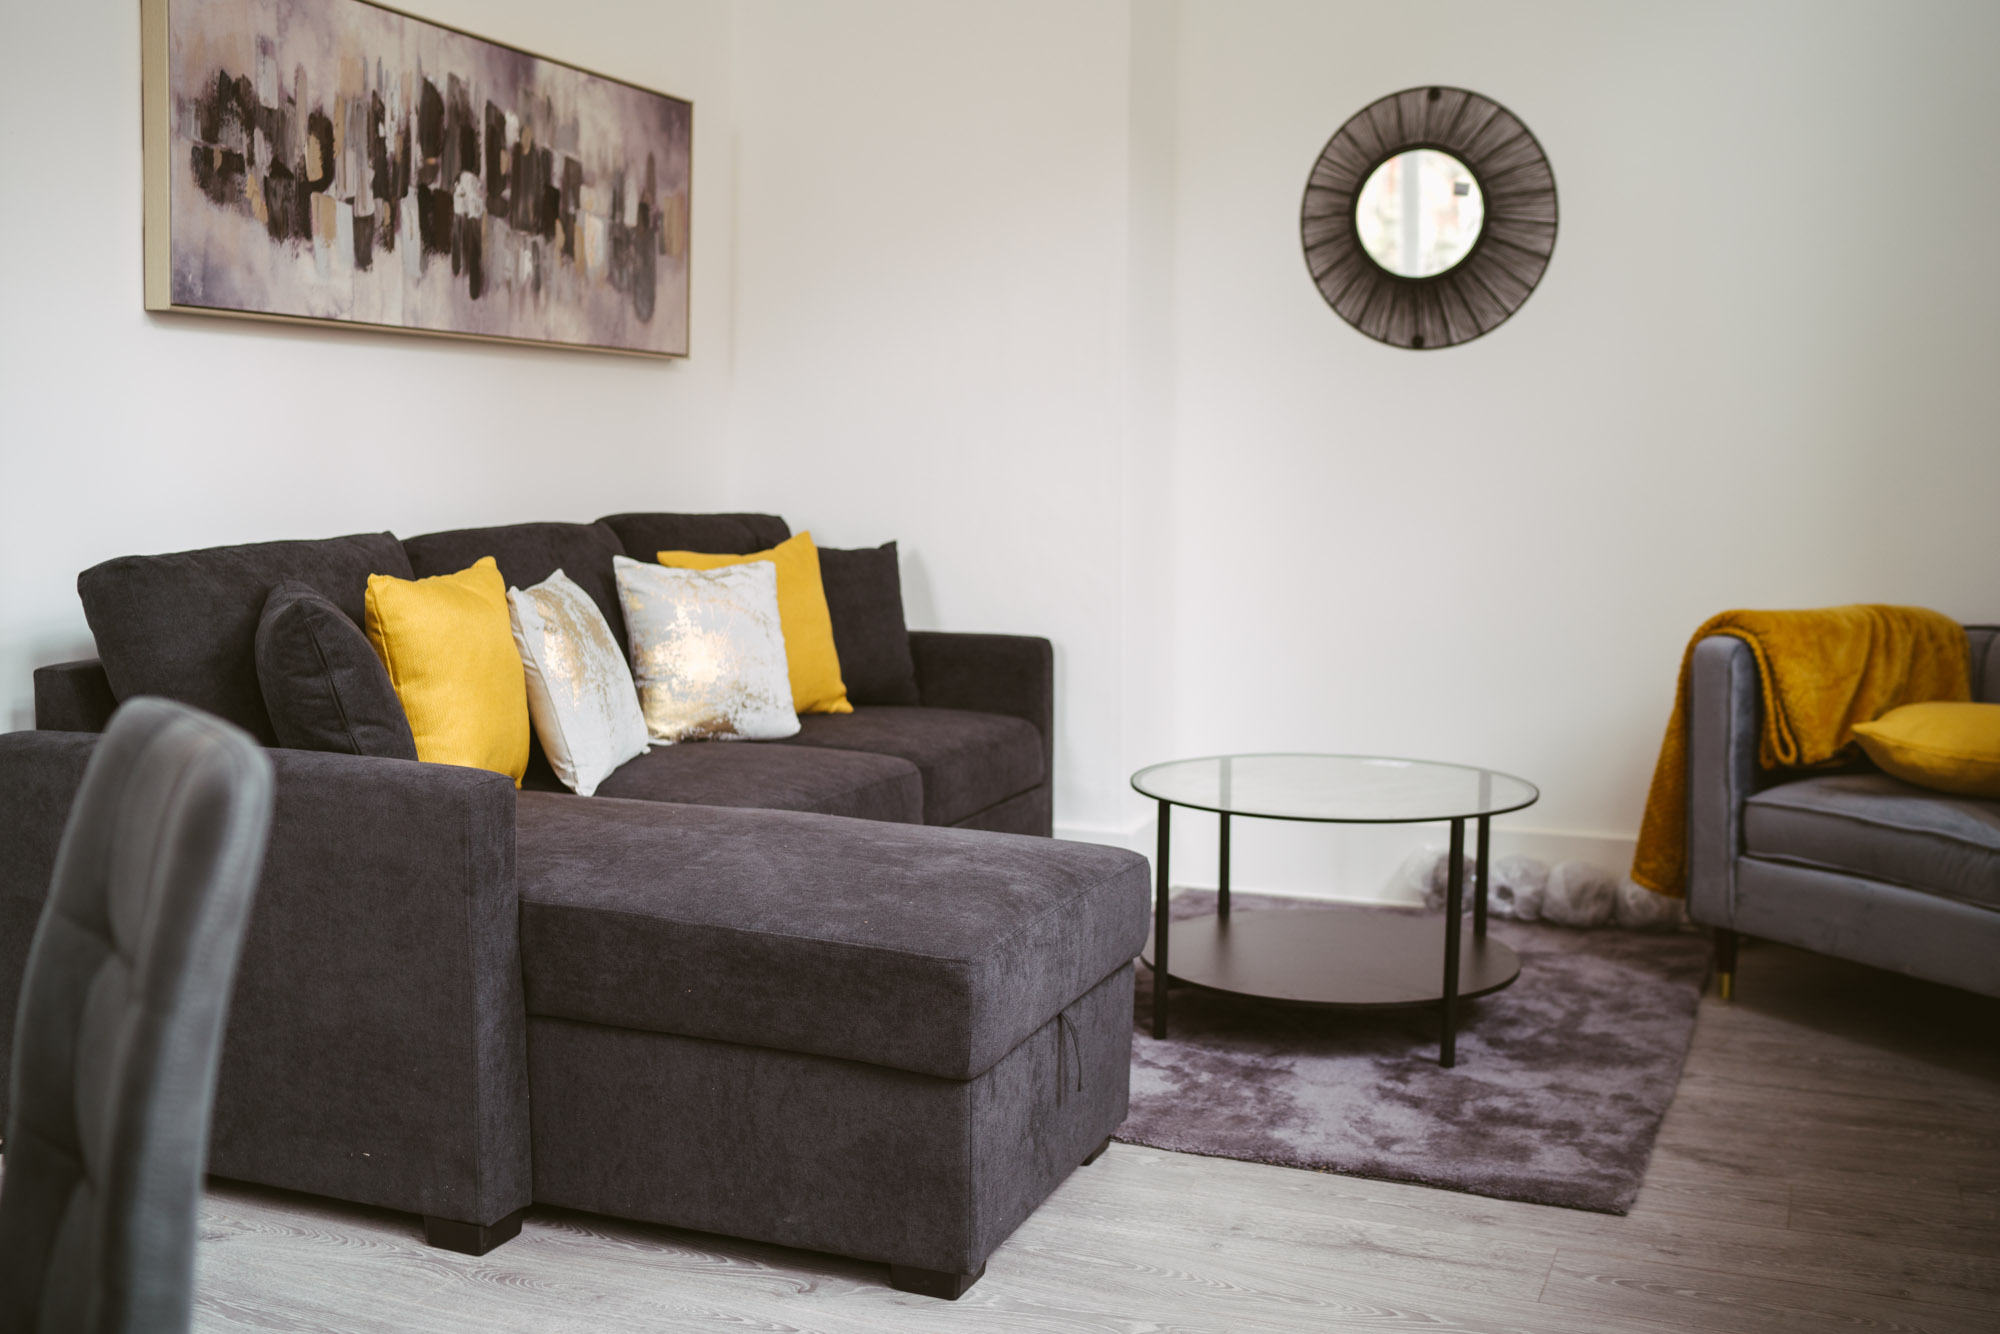 Apartment 3 -Lounge